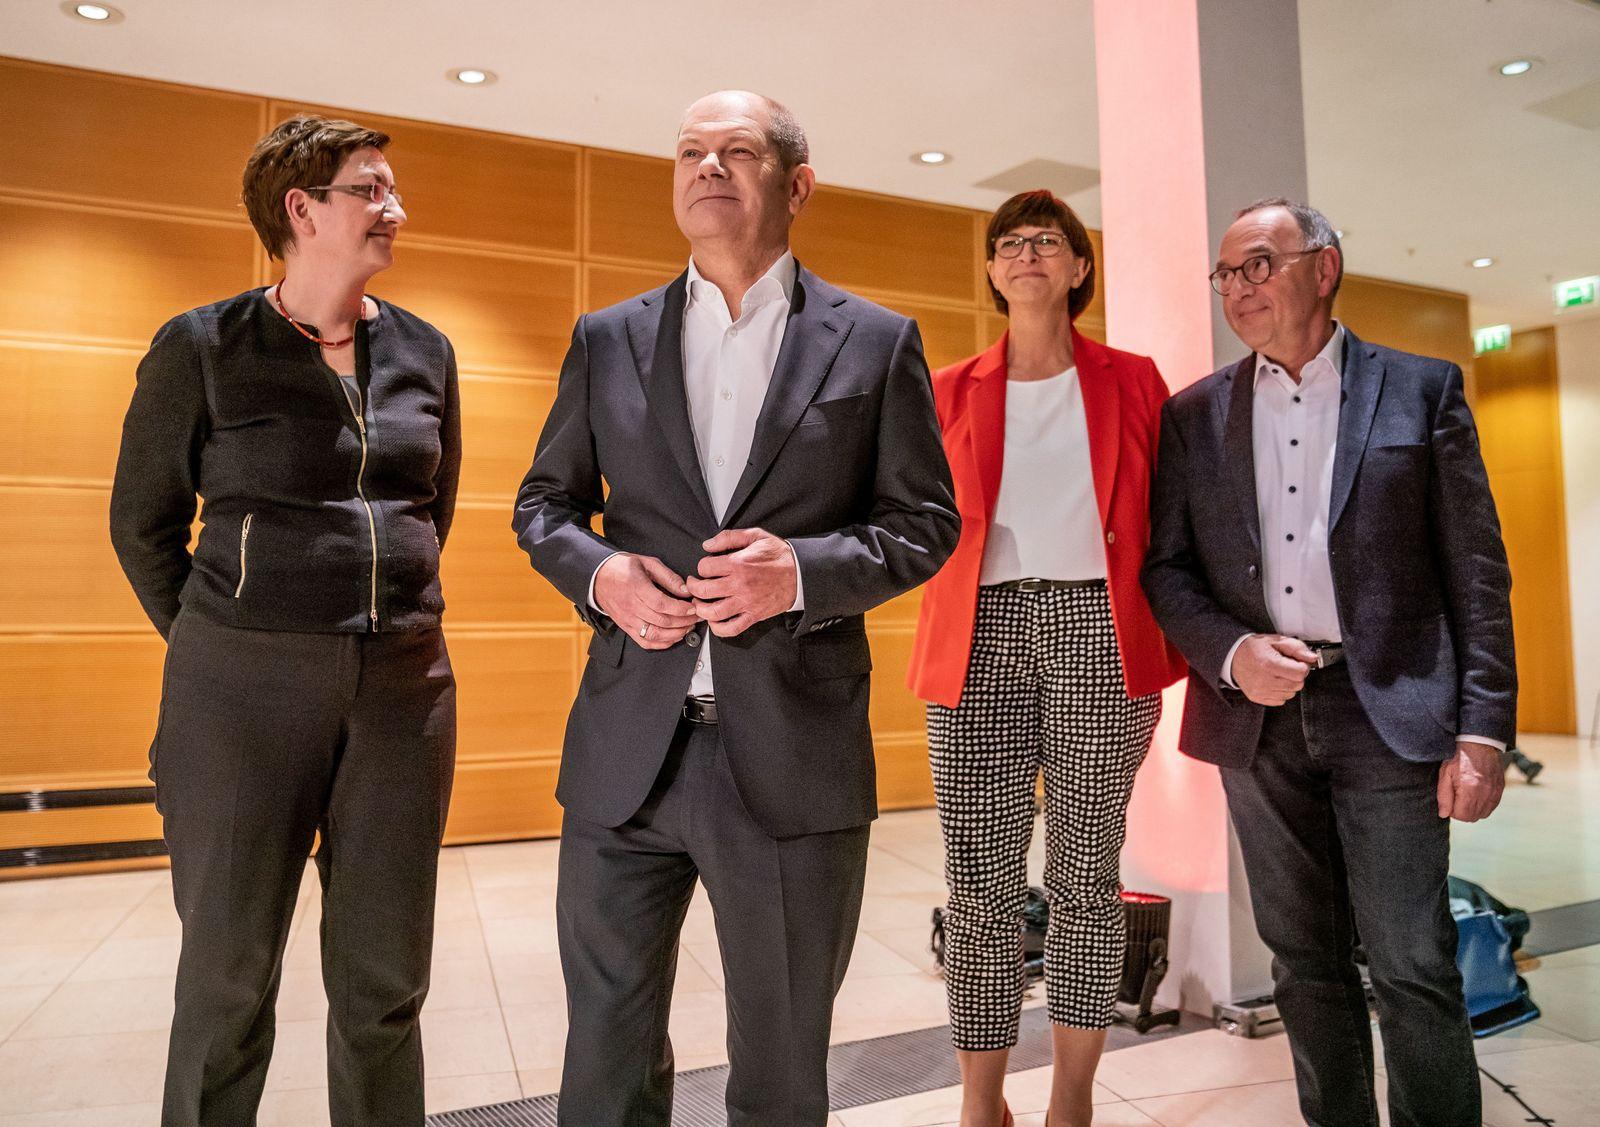 Olaf Scholz/ Klara Geywitz/ Norbert Walter-Borjans/ Saskia Esken